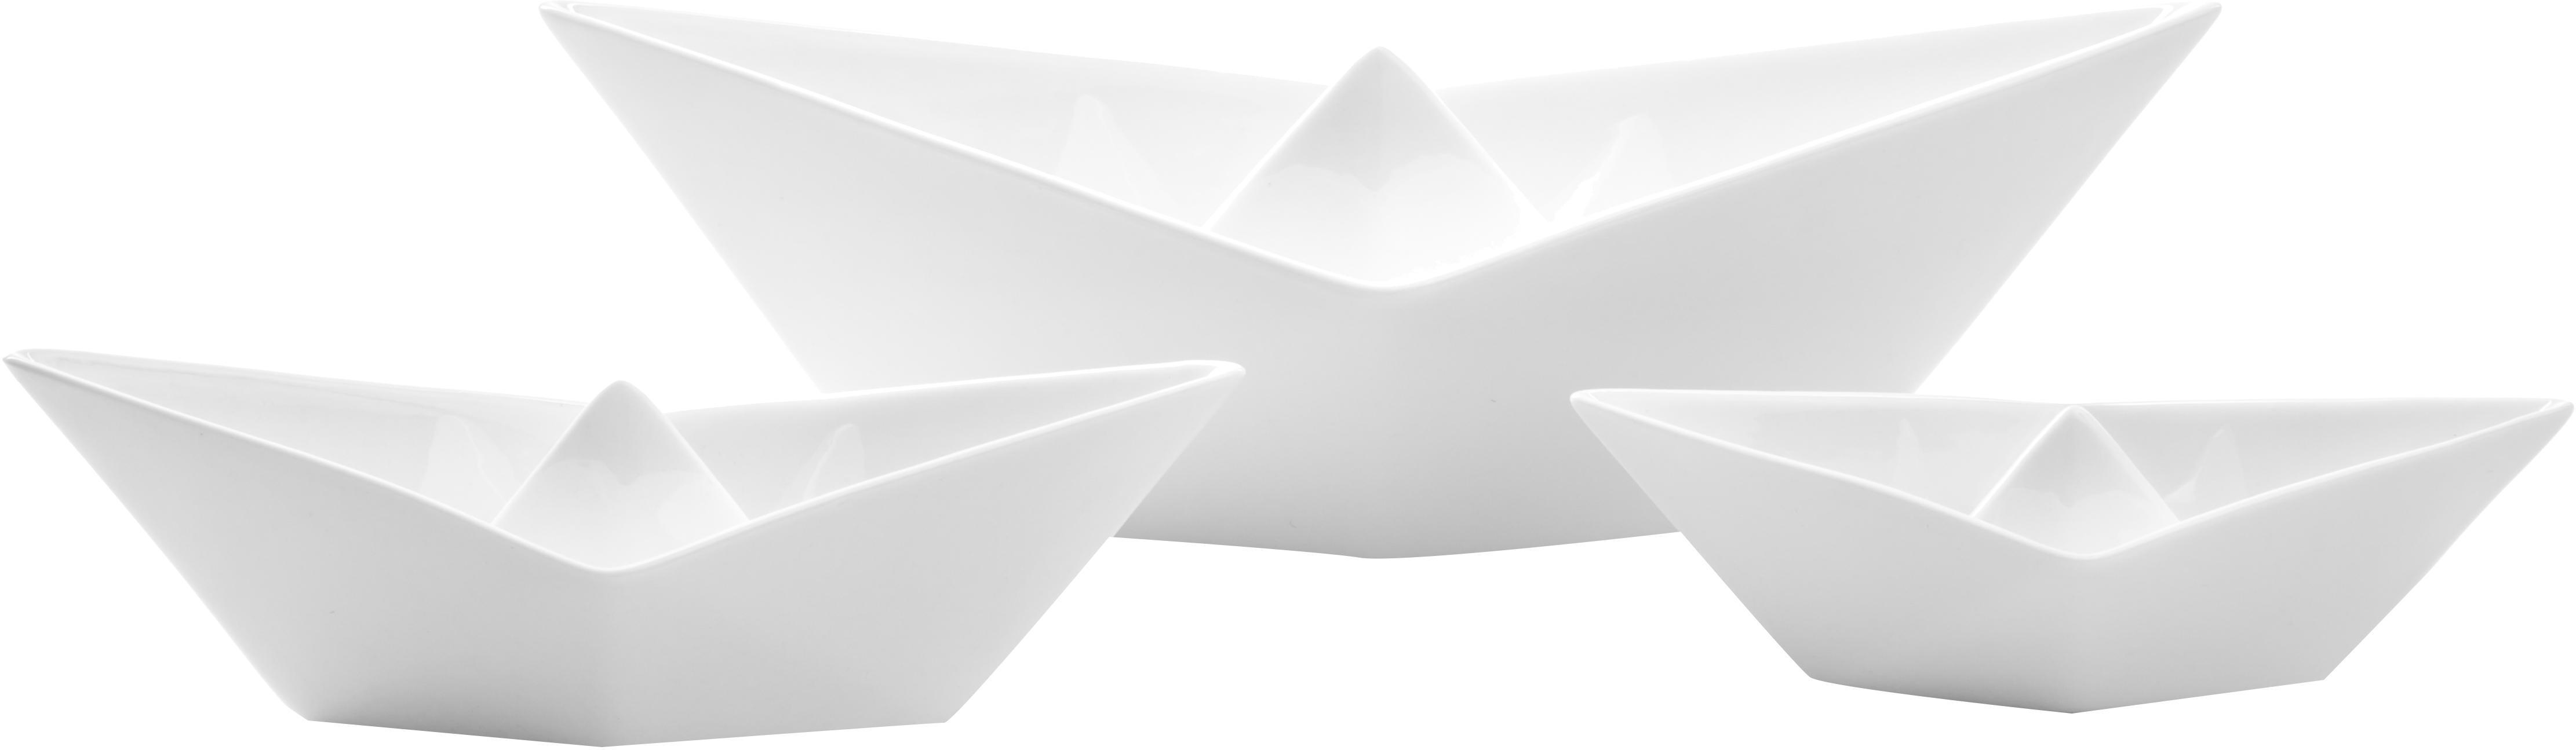 Decoratieve botenset My Boat, 3-delig, Porselein, Wit, Verschillende formaten